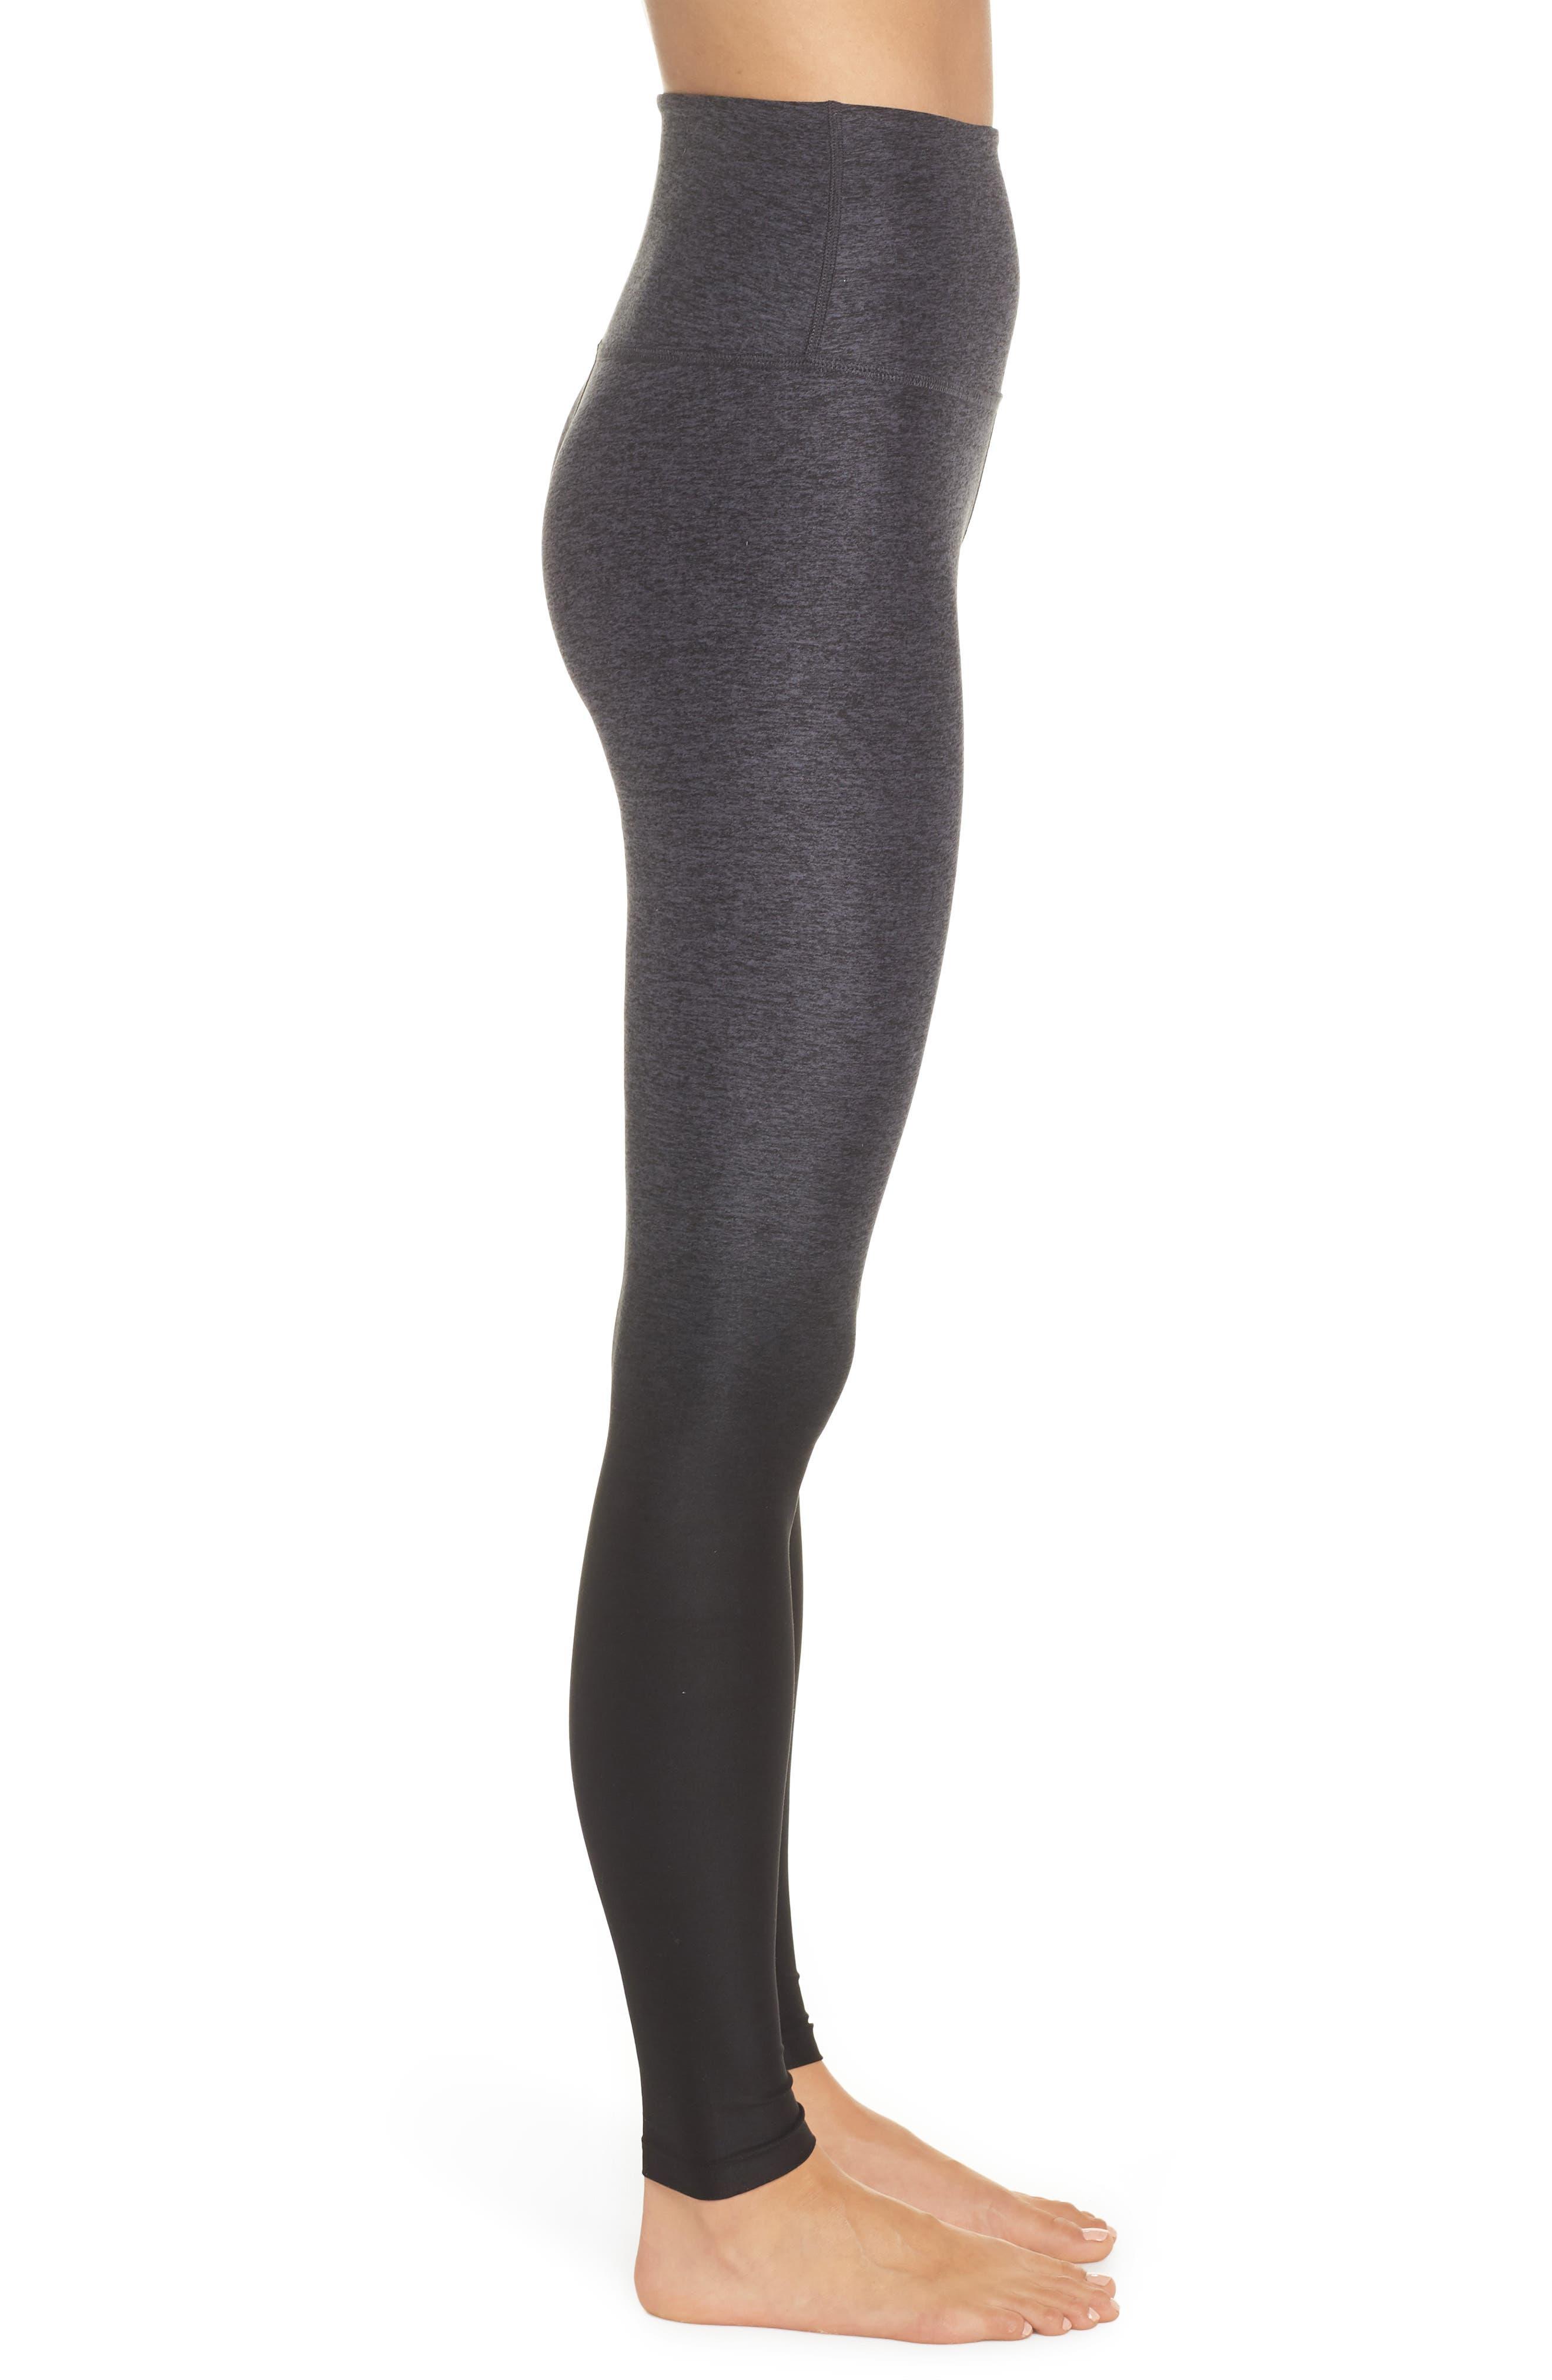 Space Dye High Waist Leggings,                             Alternate thumbnail 6, color,                             Black Steel Ombre